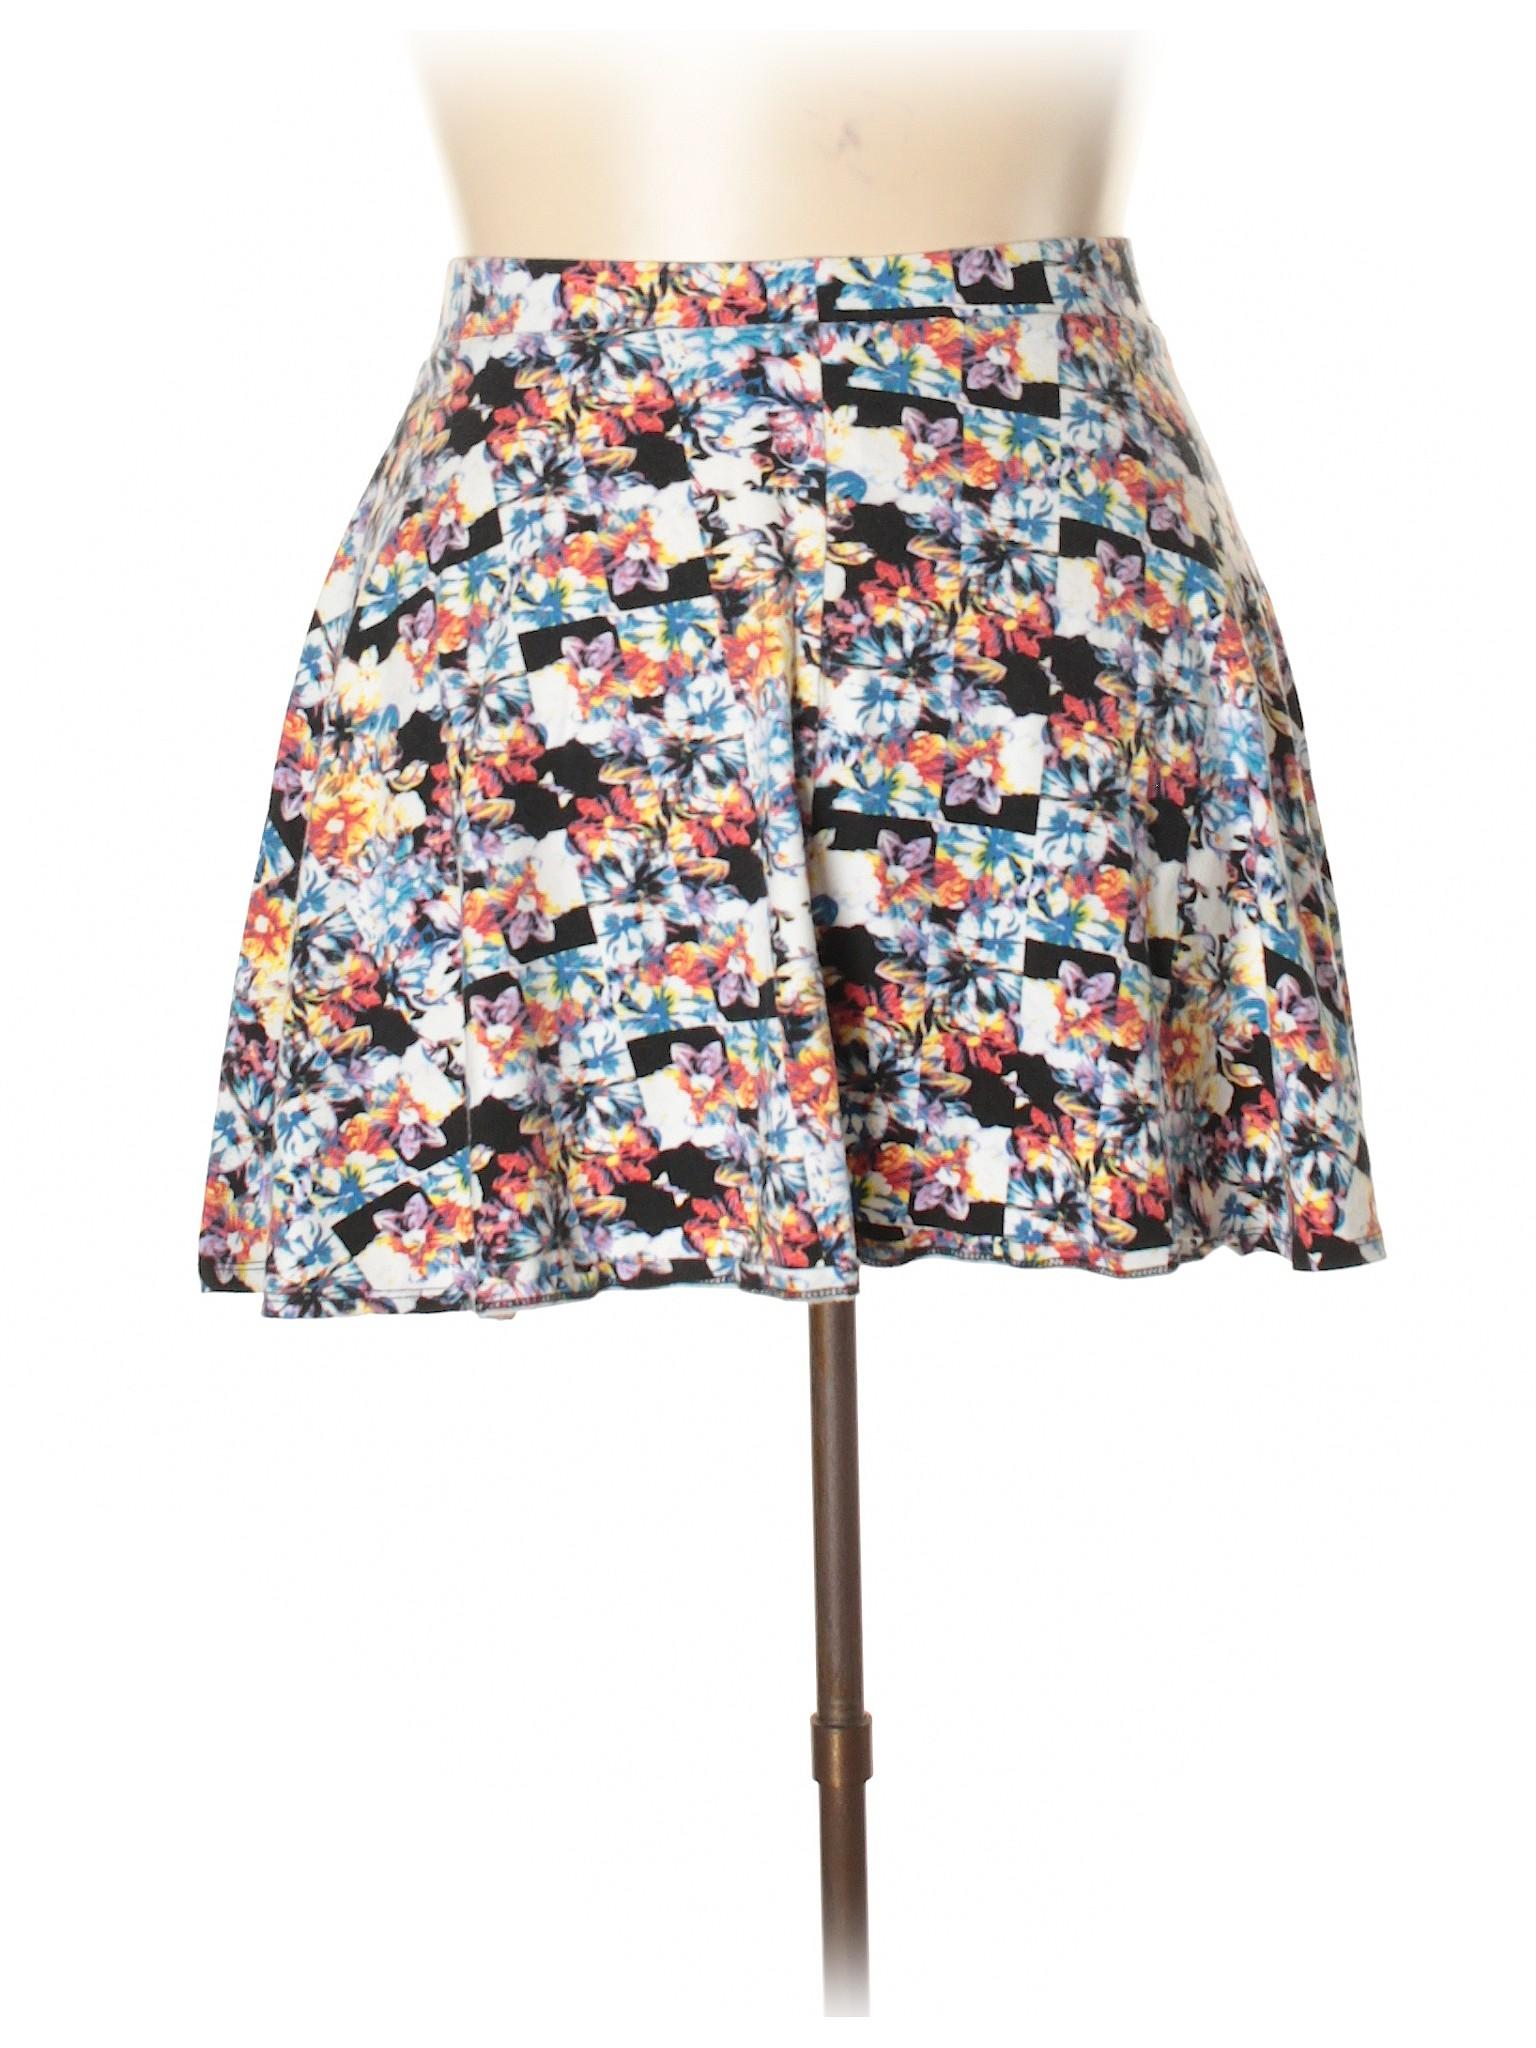 Boutique Skirt Skirt Skirt Casual Boutique Casual Casual Boutique Skirt Boutique Casual rxqwpr71nF